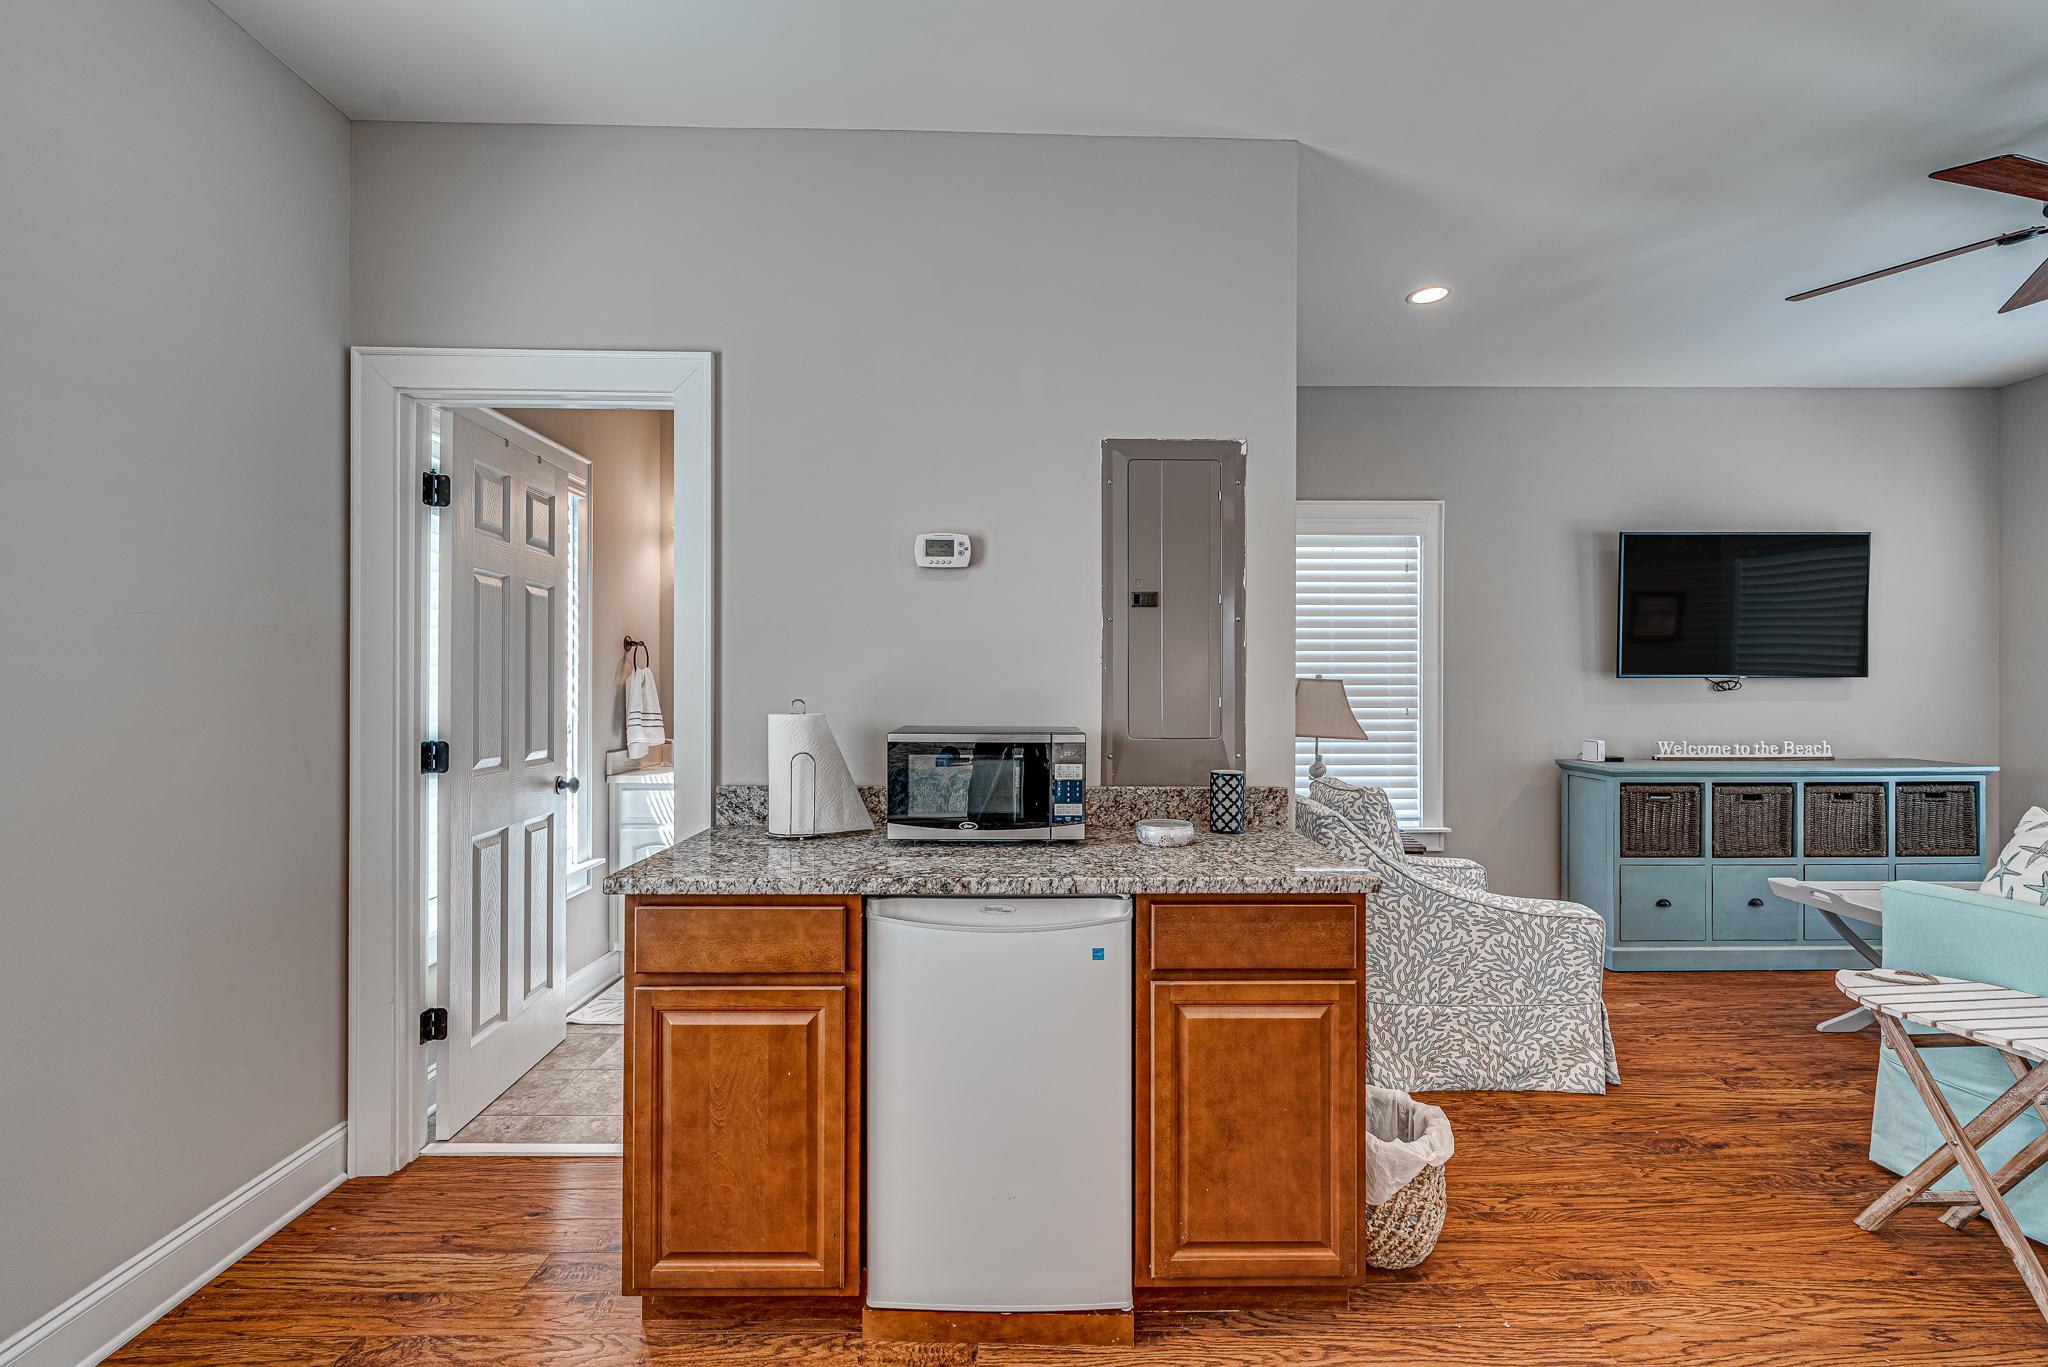 Daniel Island Smythe Park Homes For Sale - 1410 Wando View, Charleston, SC - 41